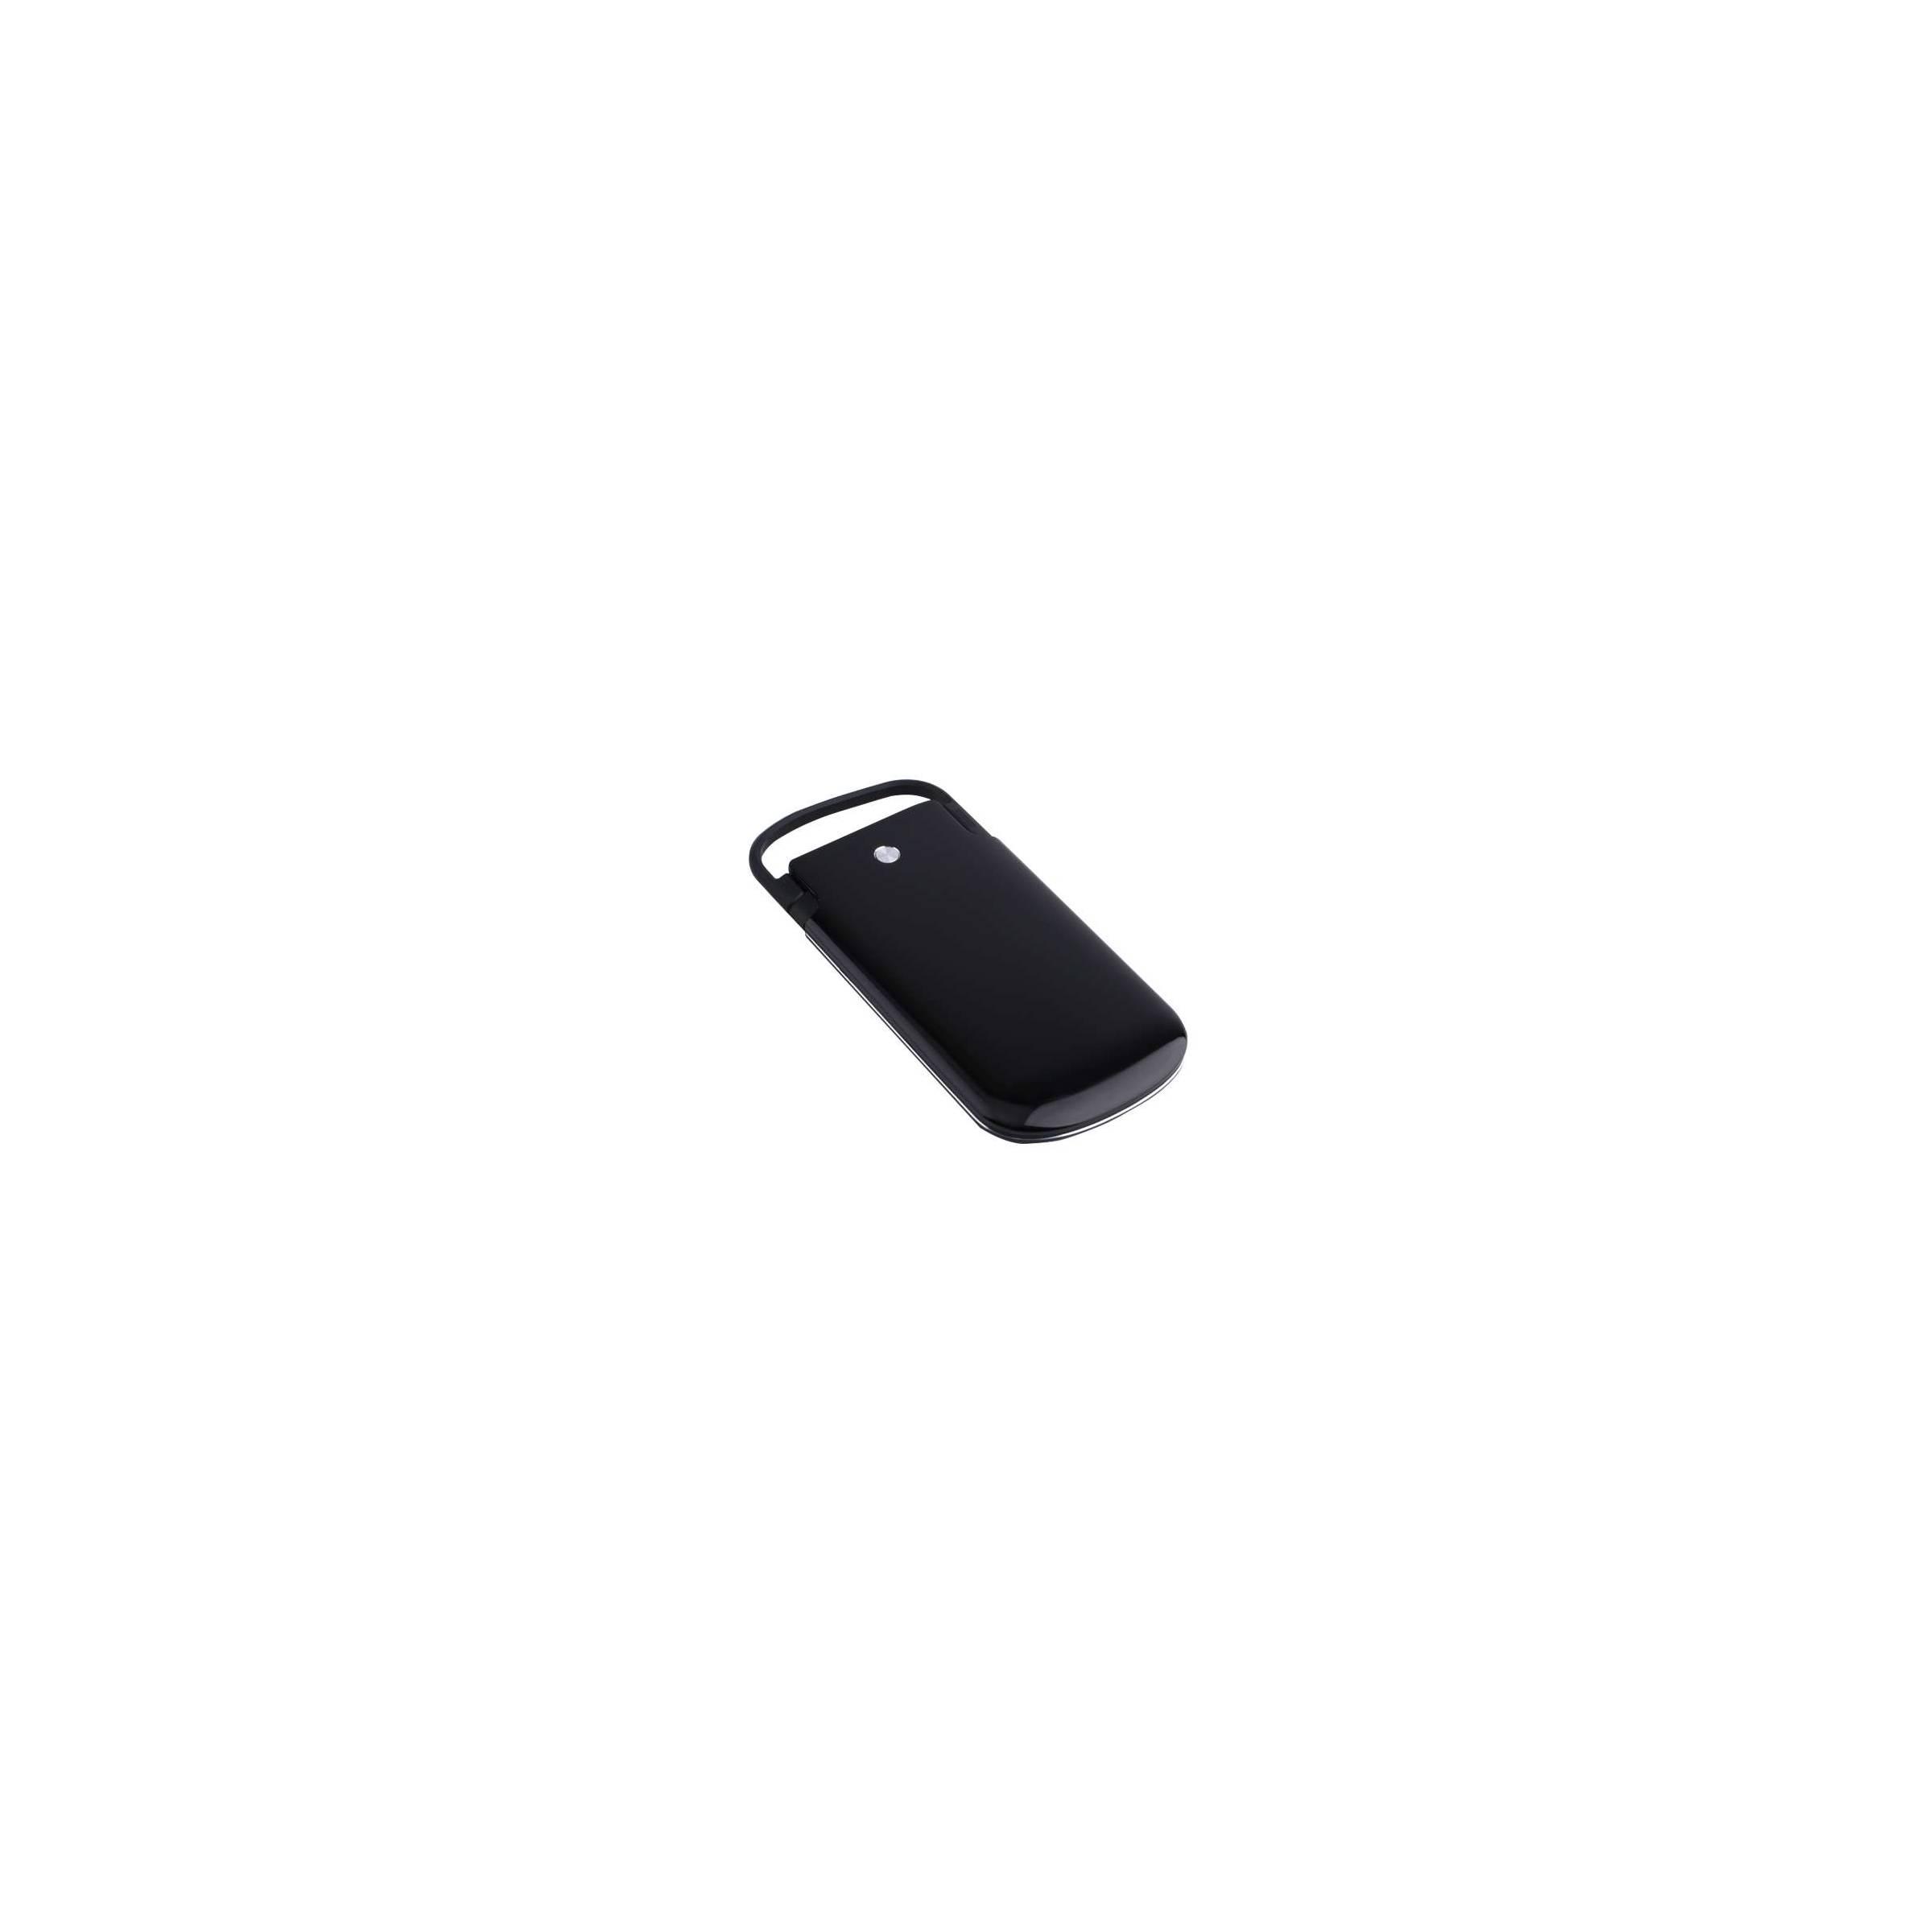 Zikko powerbag 6000mah iphone & ipad mfi powerbank farve sort fra zikko på mackabler.dk